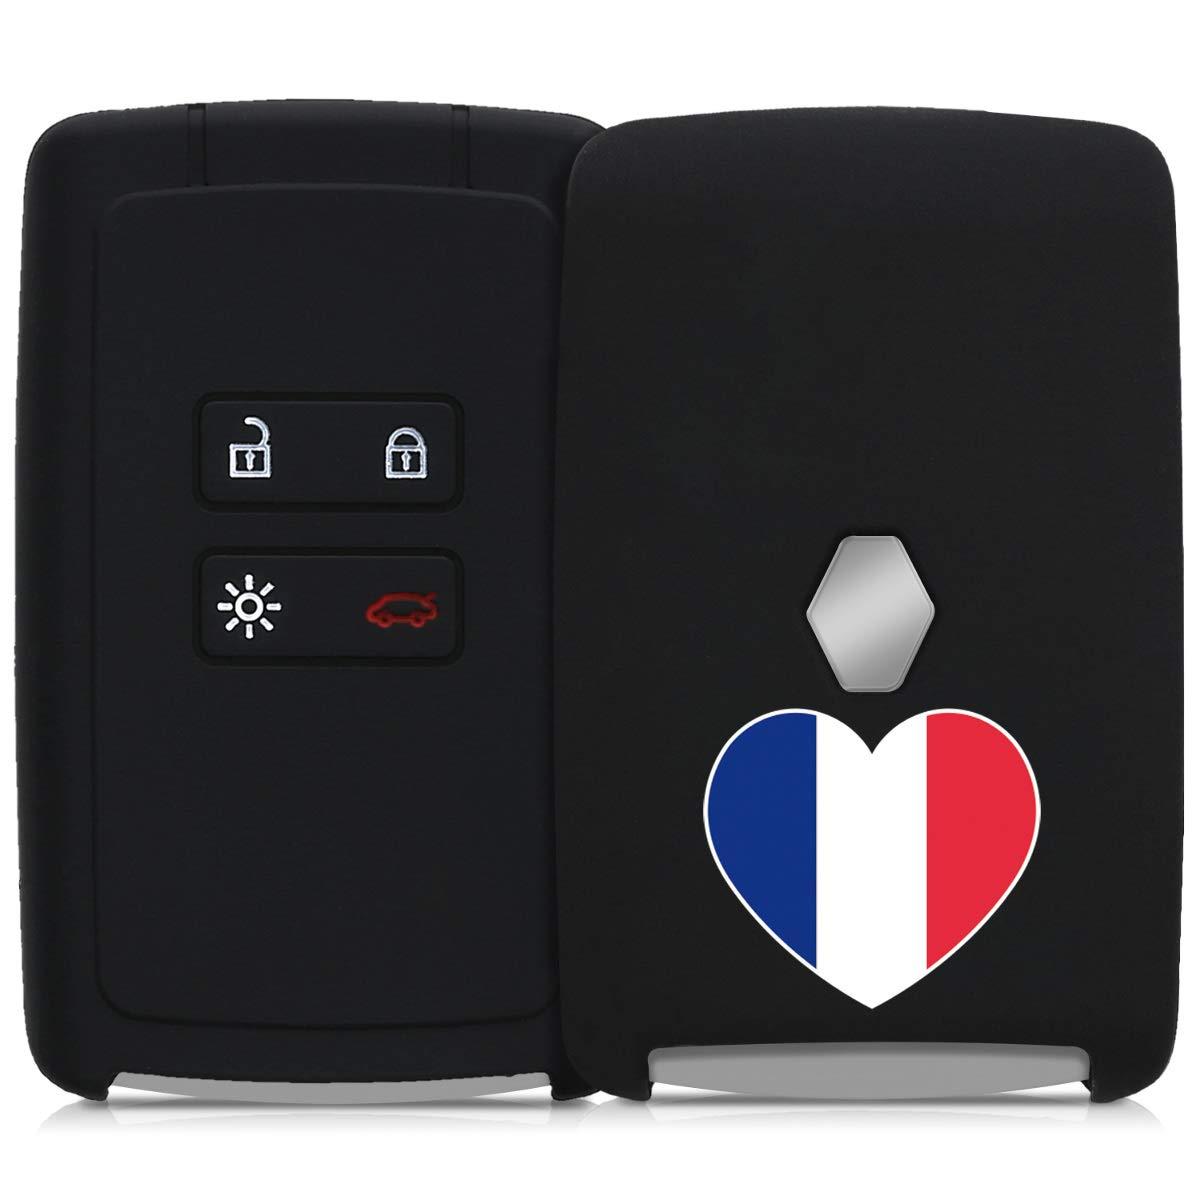 - Case Mando de Auto - Carcasa Protectora Suave kwmobile Funda de Silicona para Llave Smart Key de 4 Botones para Coche Renault Silicona Solamente Keyless Go Azul de